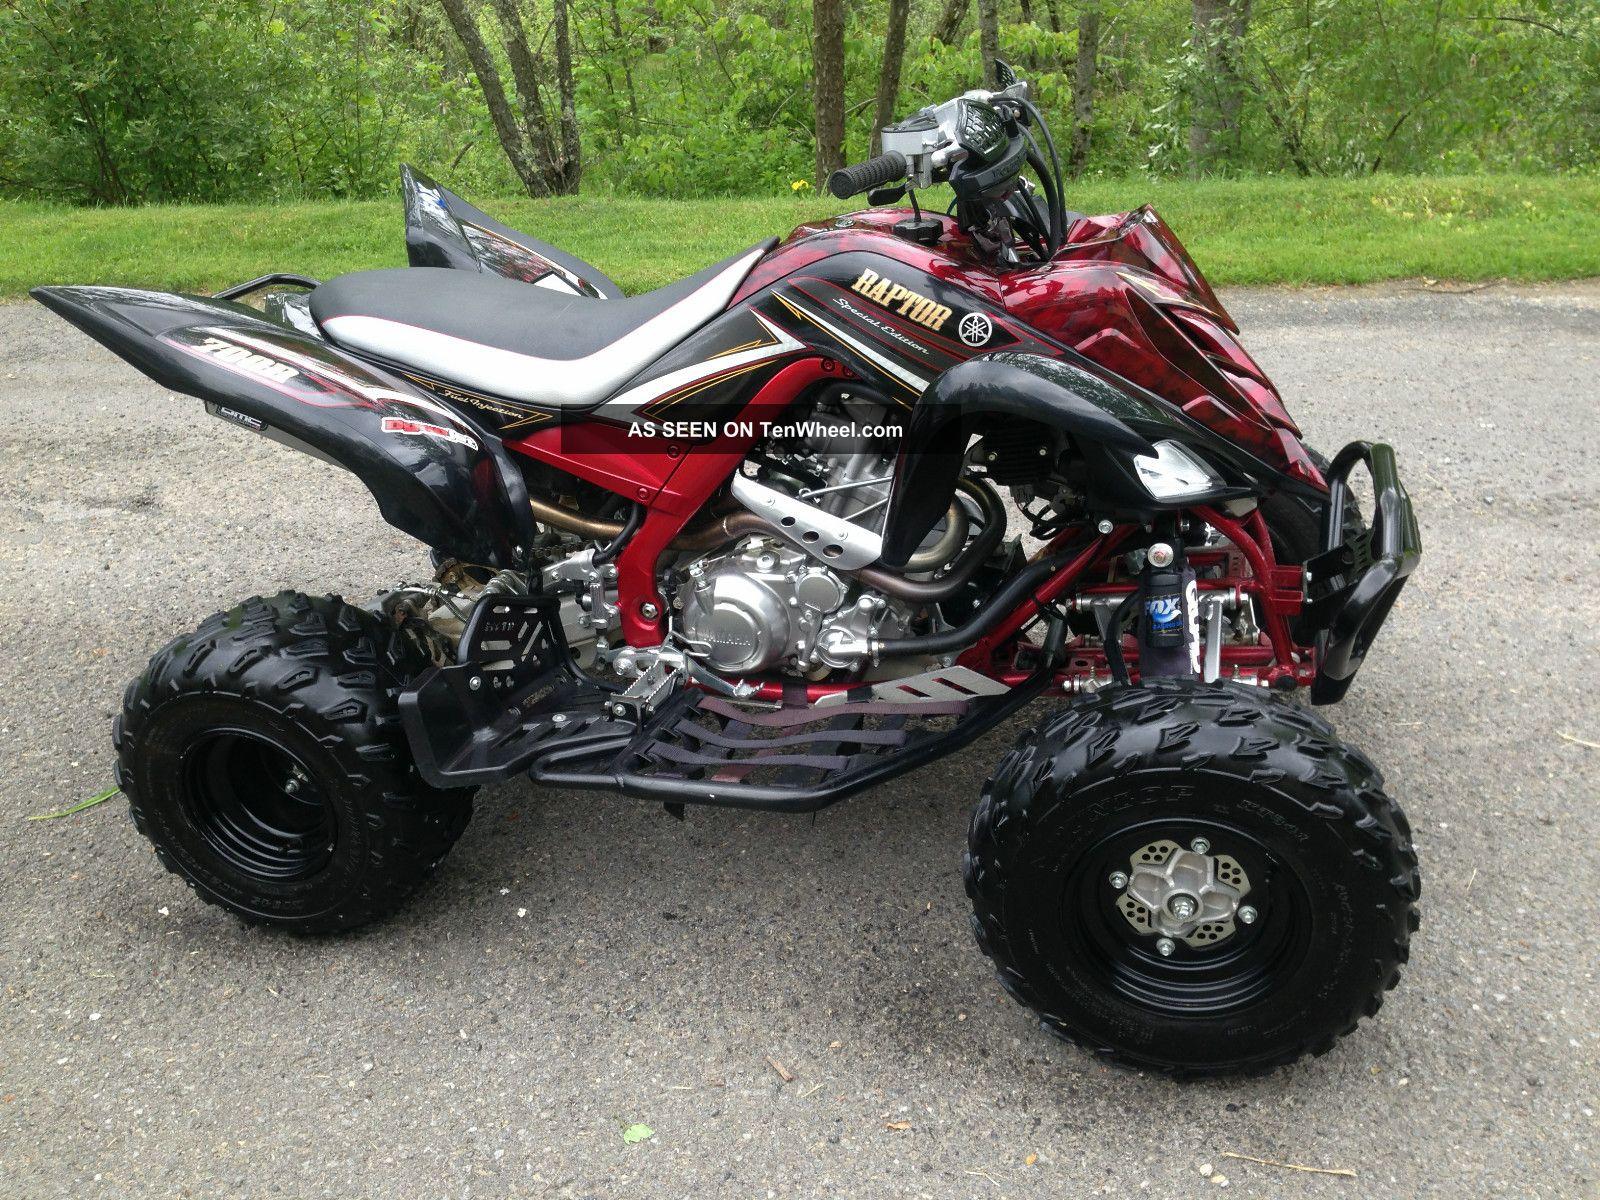 YAMAHA RAPTOR atv quad offroad motorbike bike dirtbike hd wallpaper 1600x1200